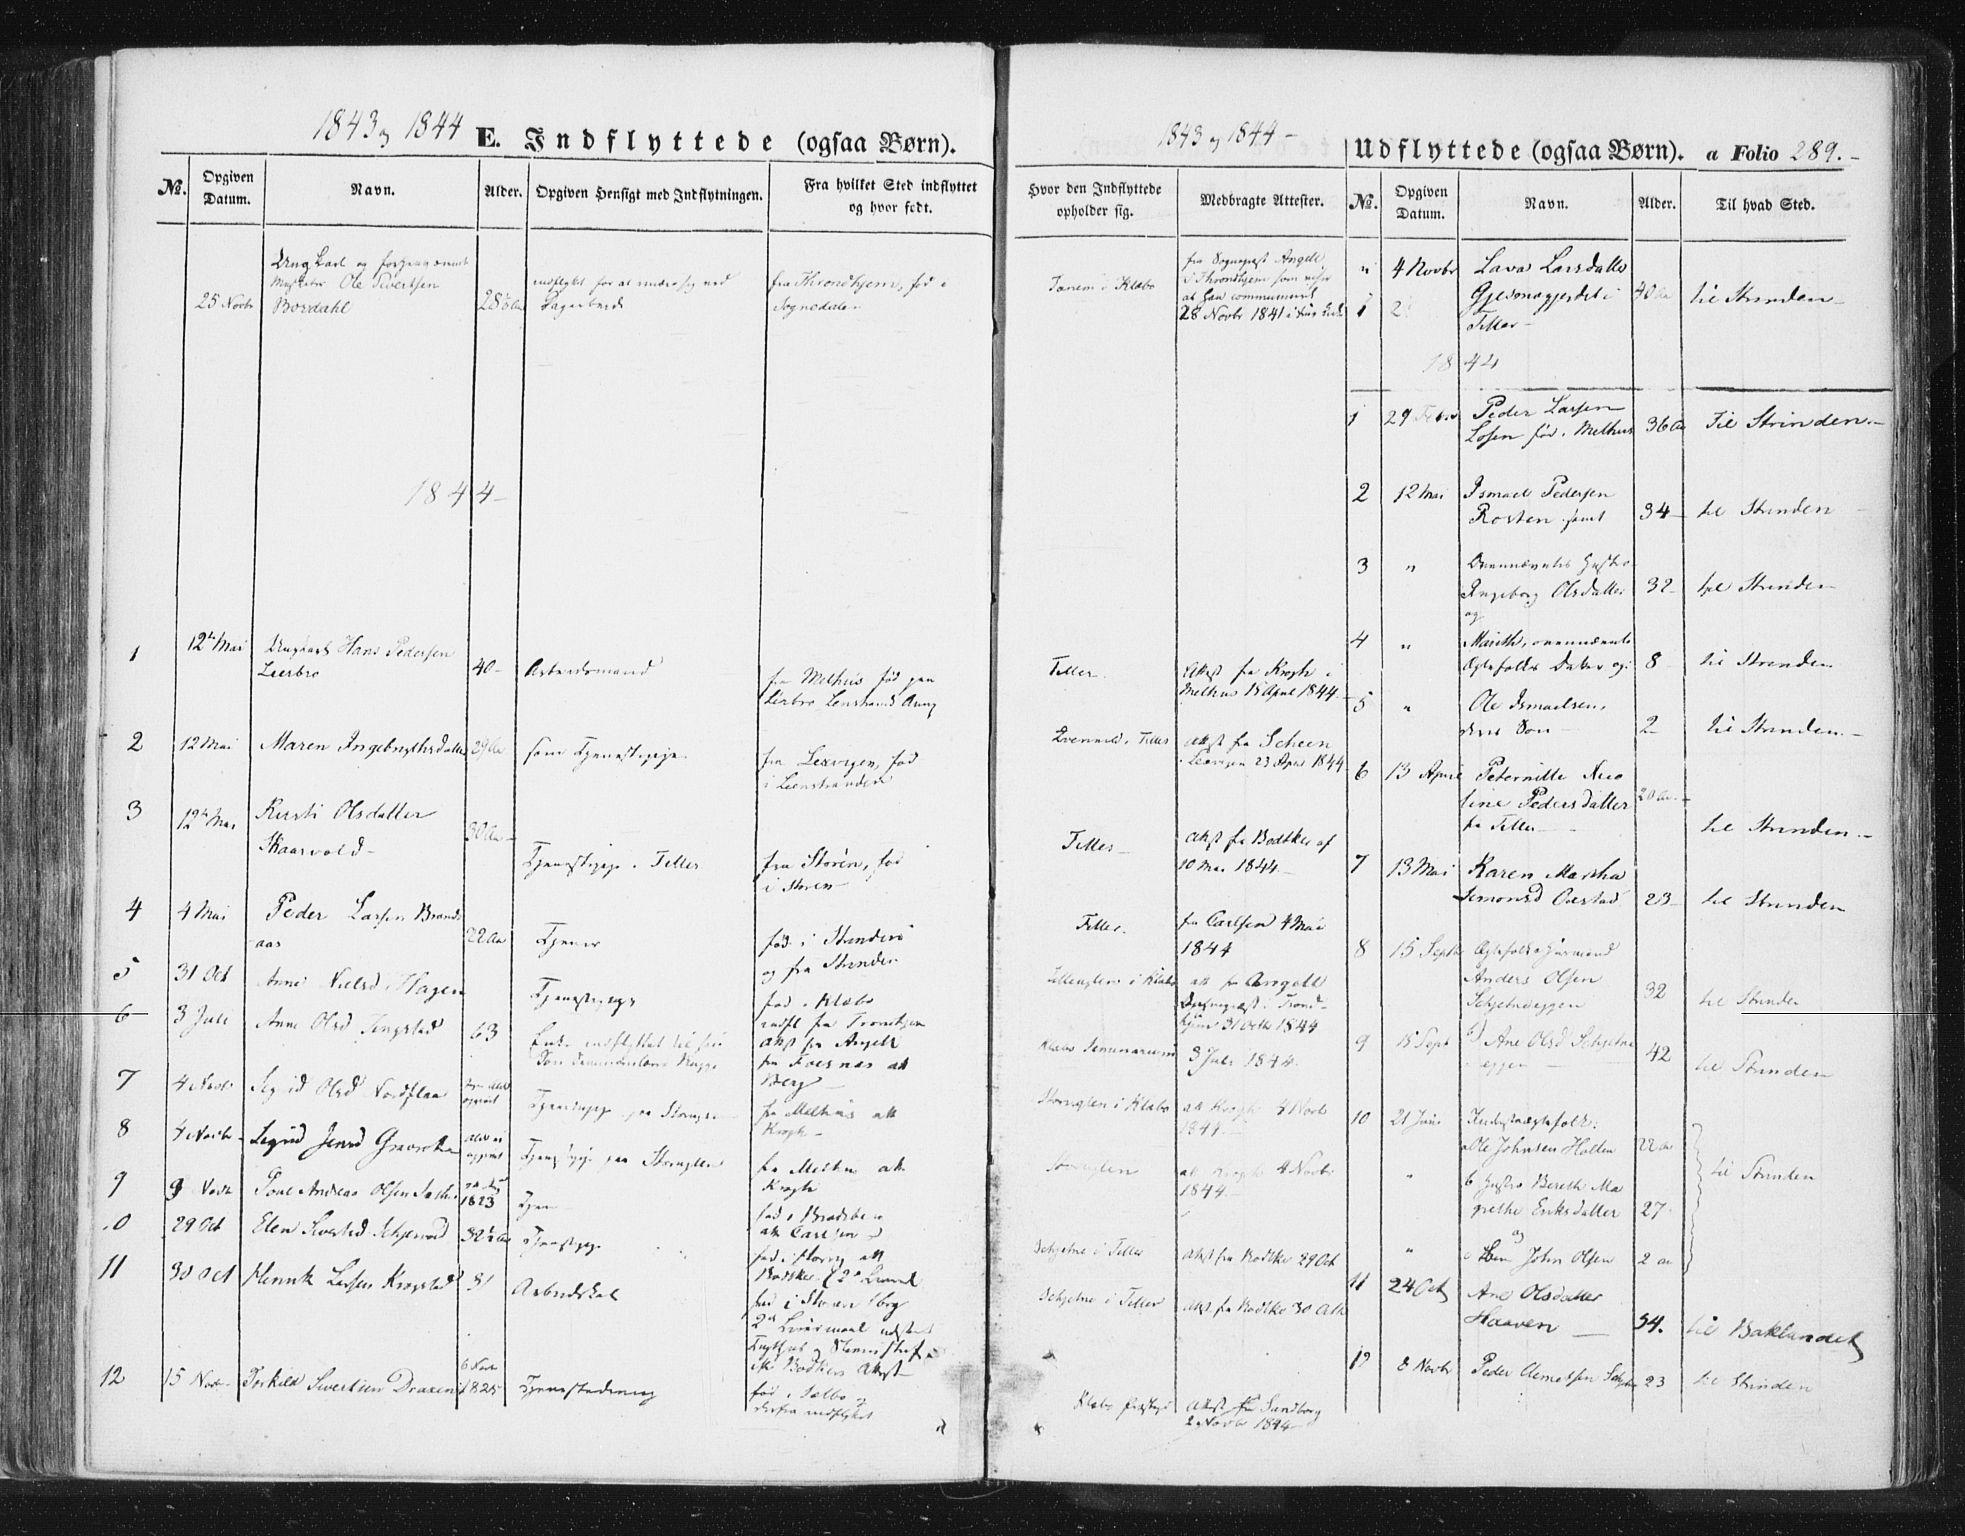 SAT, Ministerialprotokoller, klokkerbøker og fødselsregistre - Sør-Trøndelag, 618/L0441: Parish register (official) no. 618A05, 1843-1862, p. 289